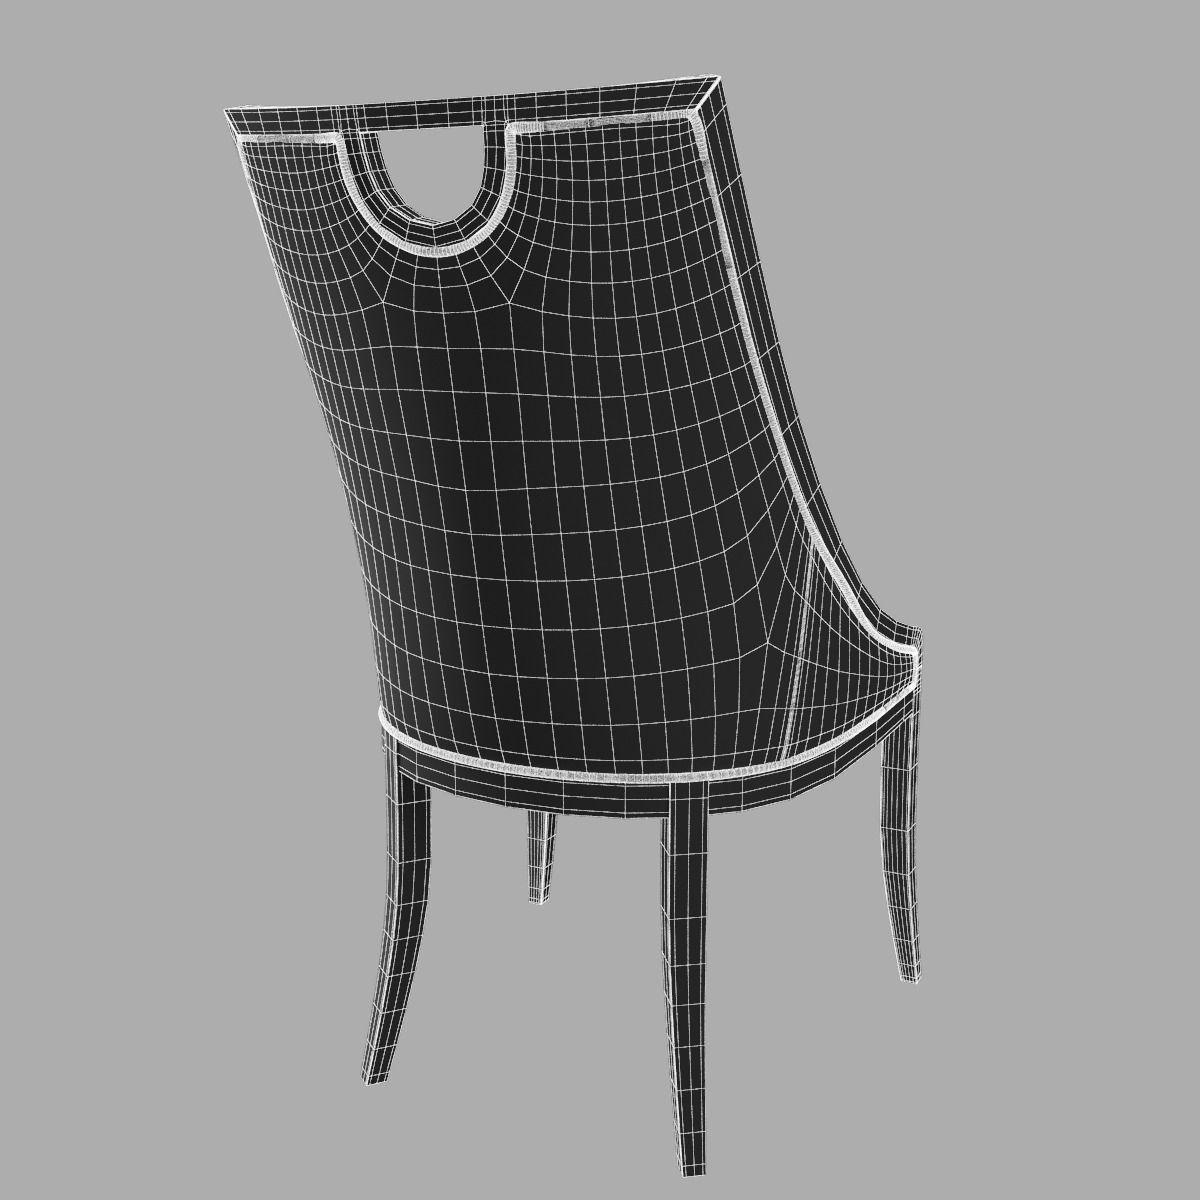 cavio artdeco line chair 3d model max 6 art deco furniture lines